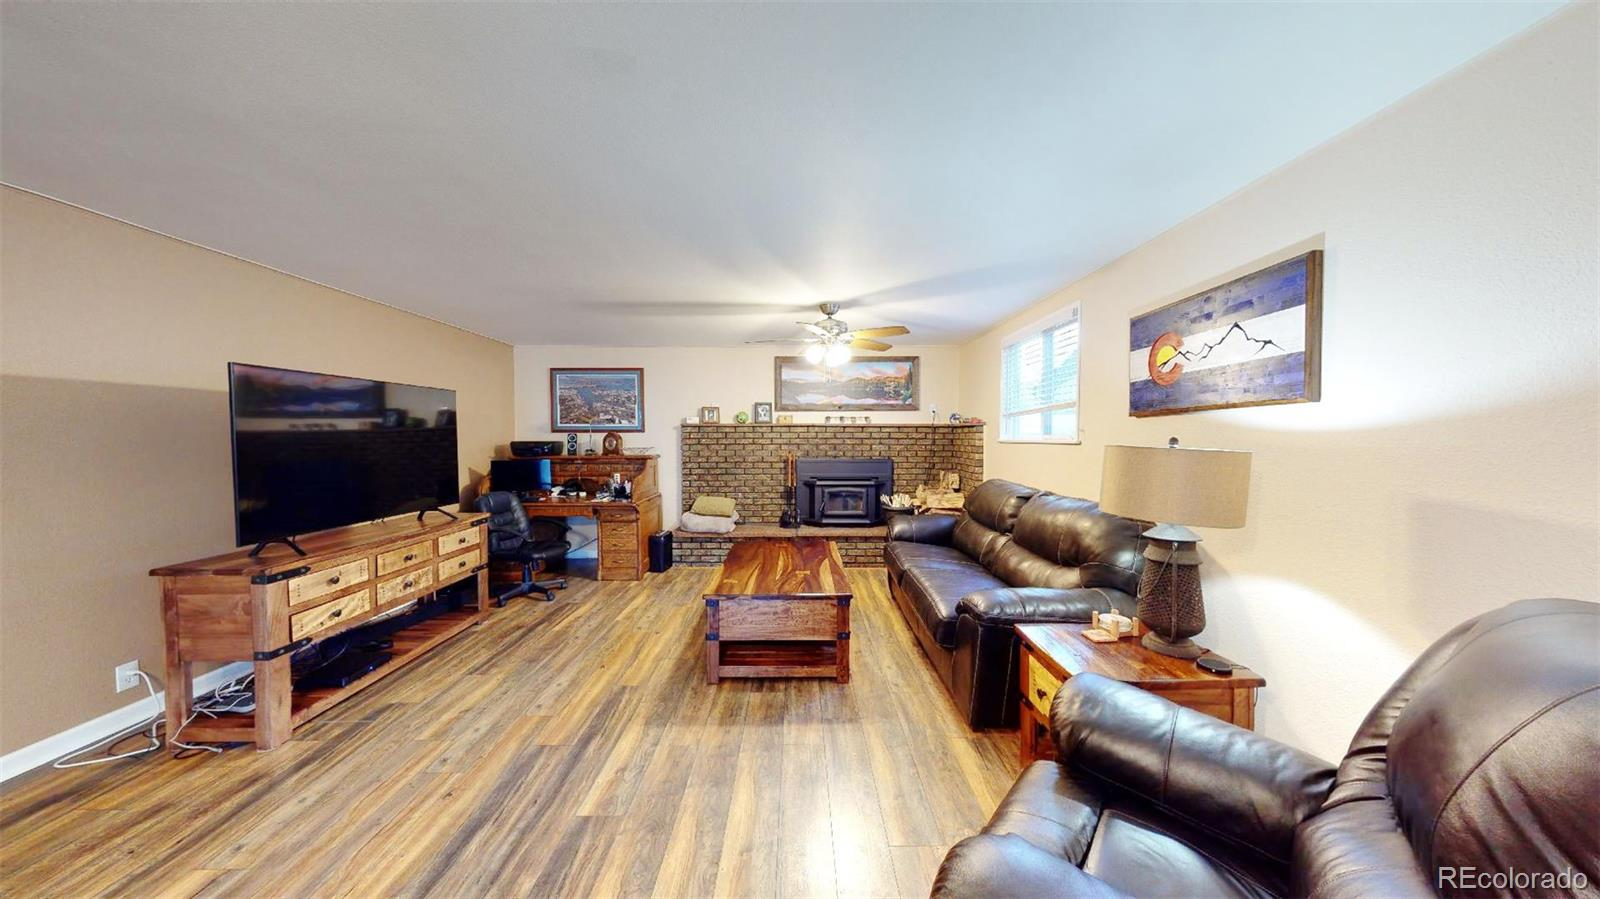 MLS# 6167151 - 15 - 1760 S Upham Street, Lakewood, CO 80232